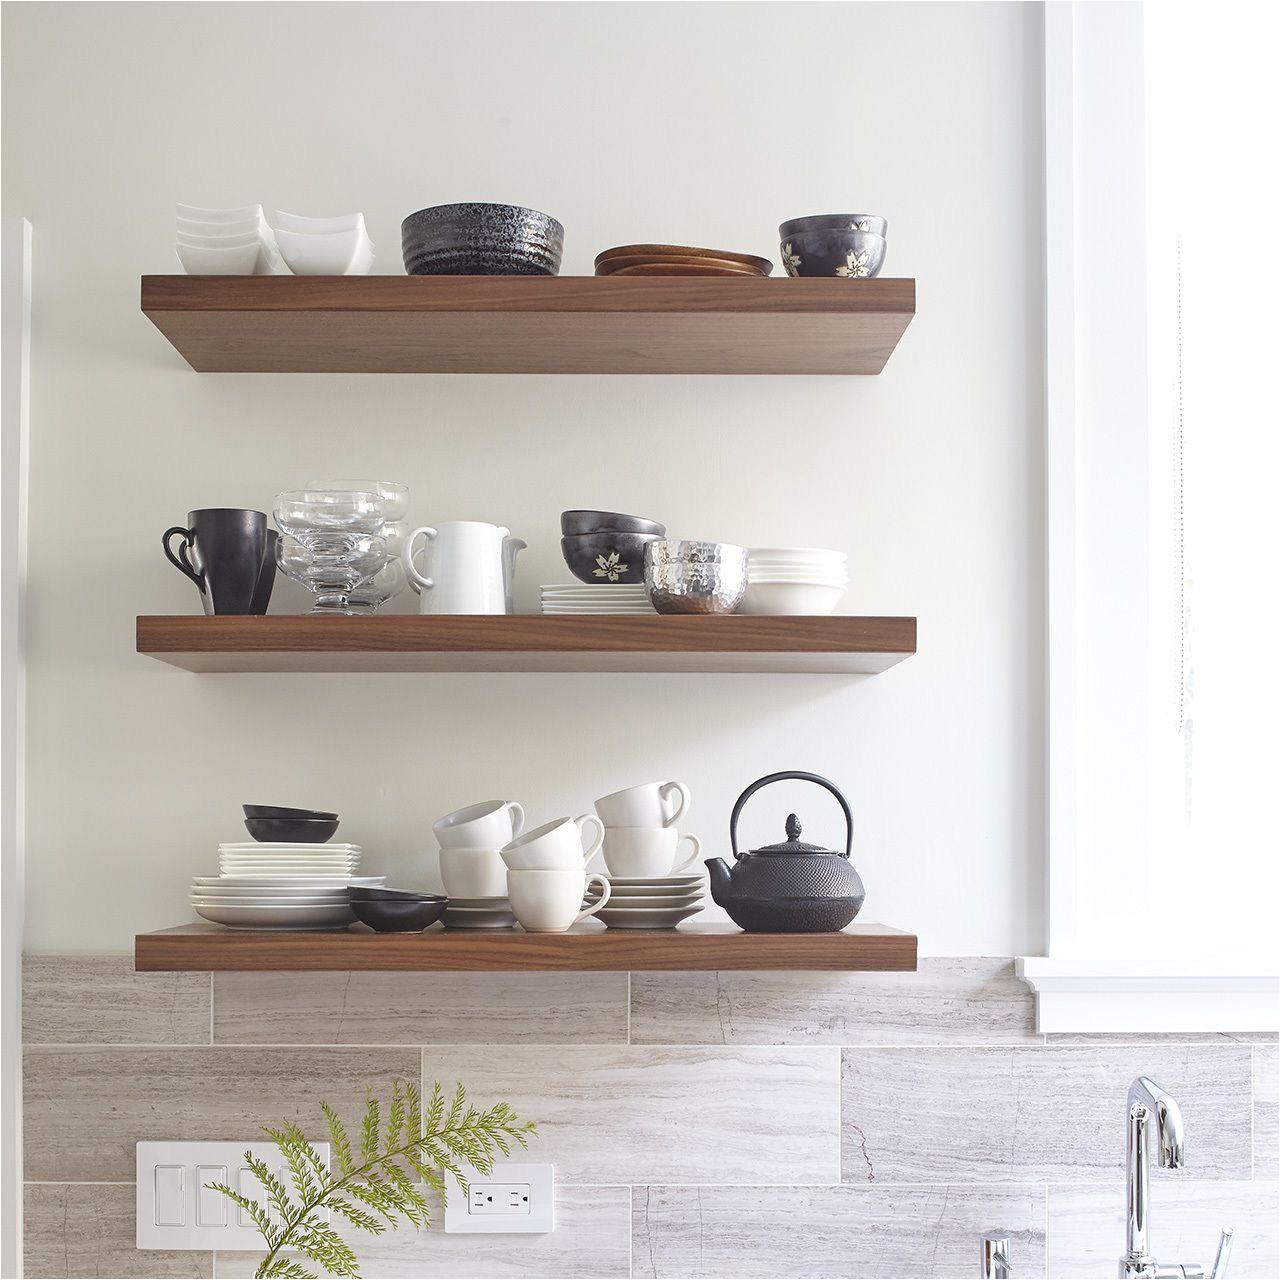 designer floating shelves for the kitchen floatingshelvesideasbuiltins